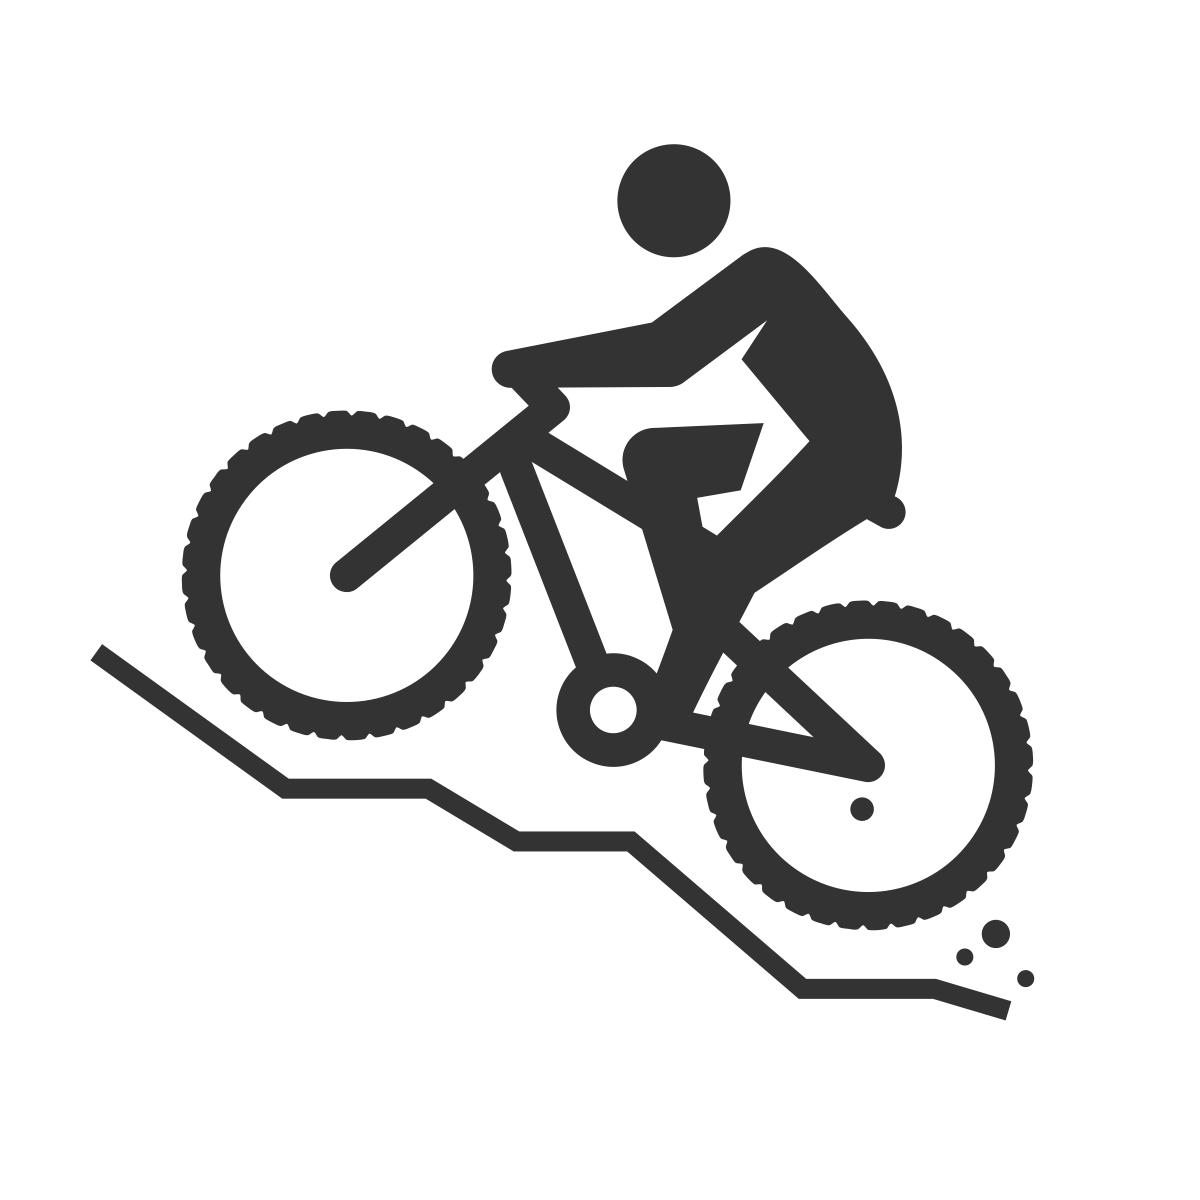 noun_mountain bike_364631_333333.png